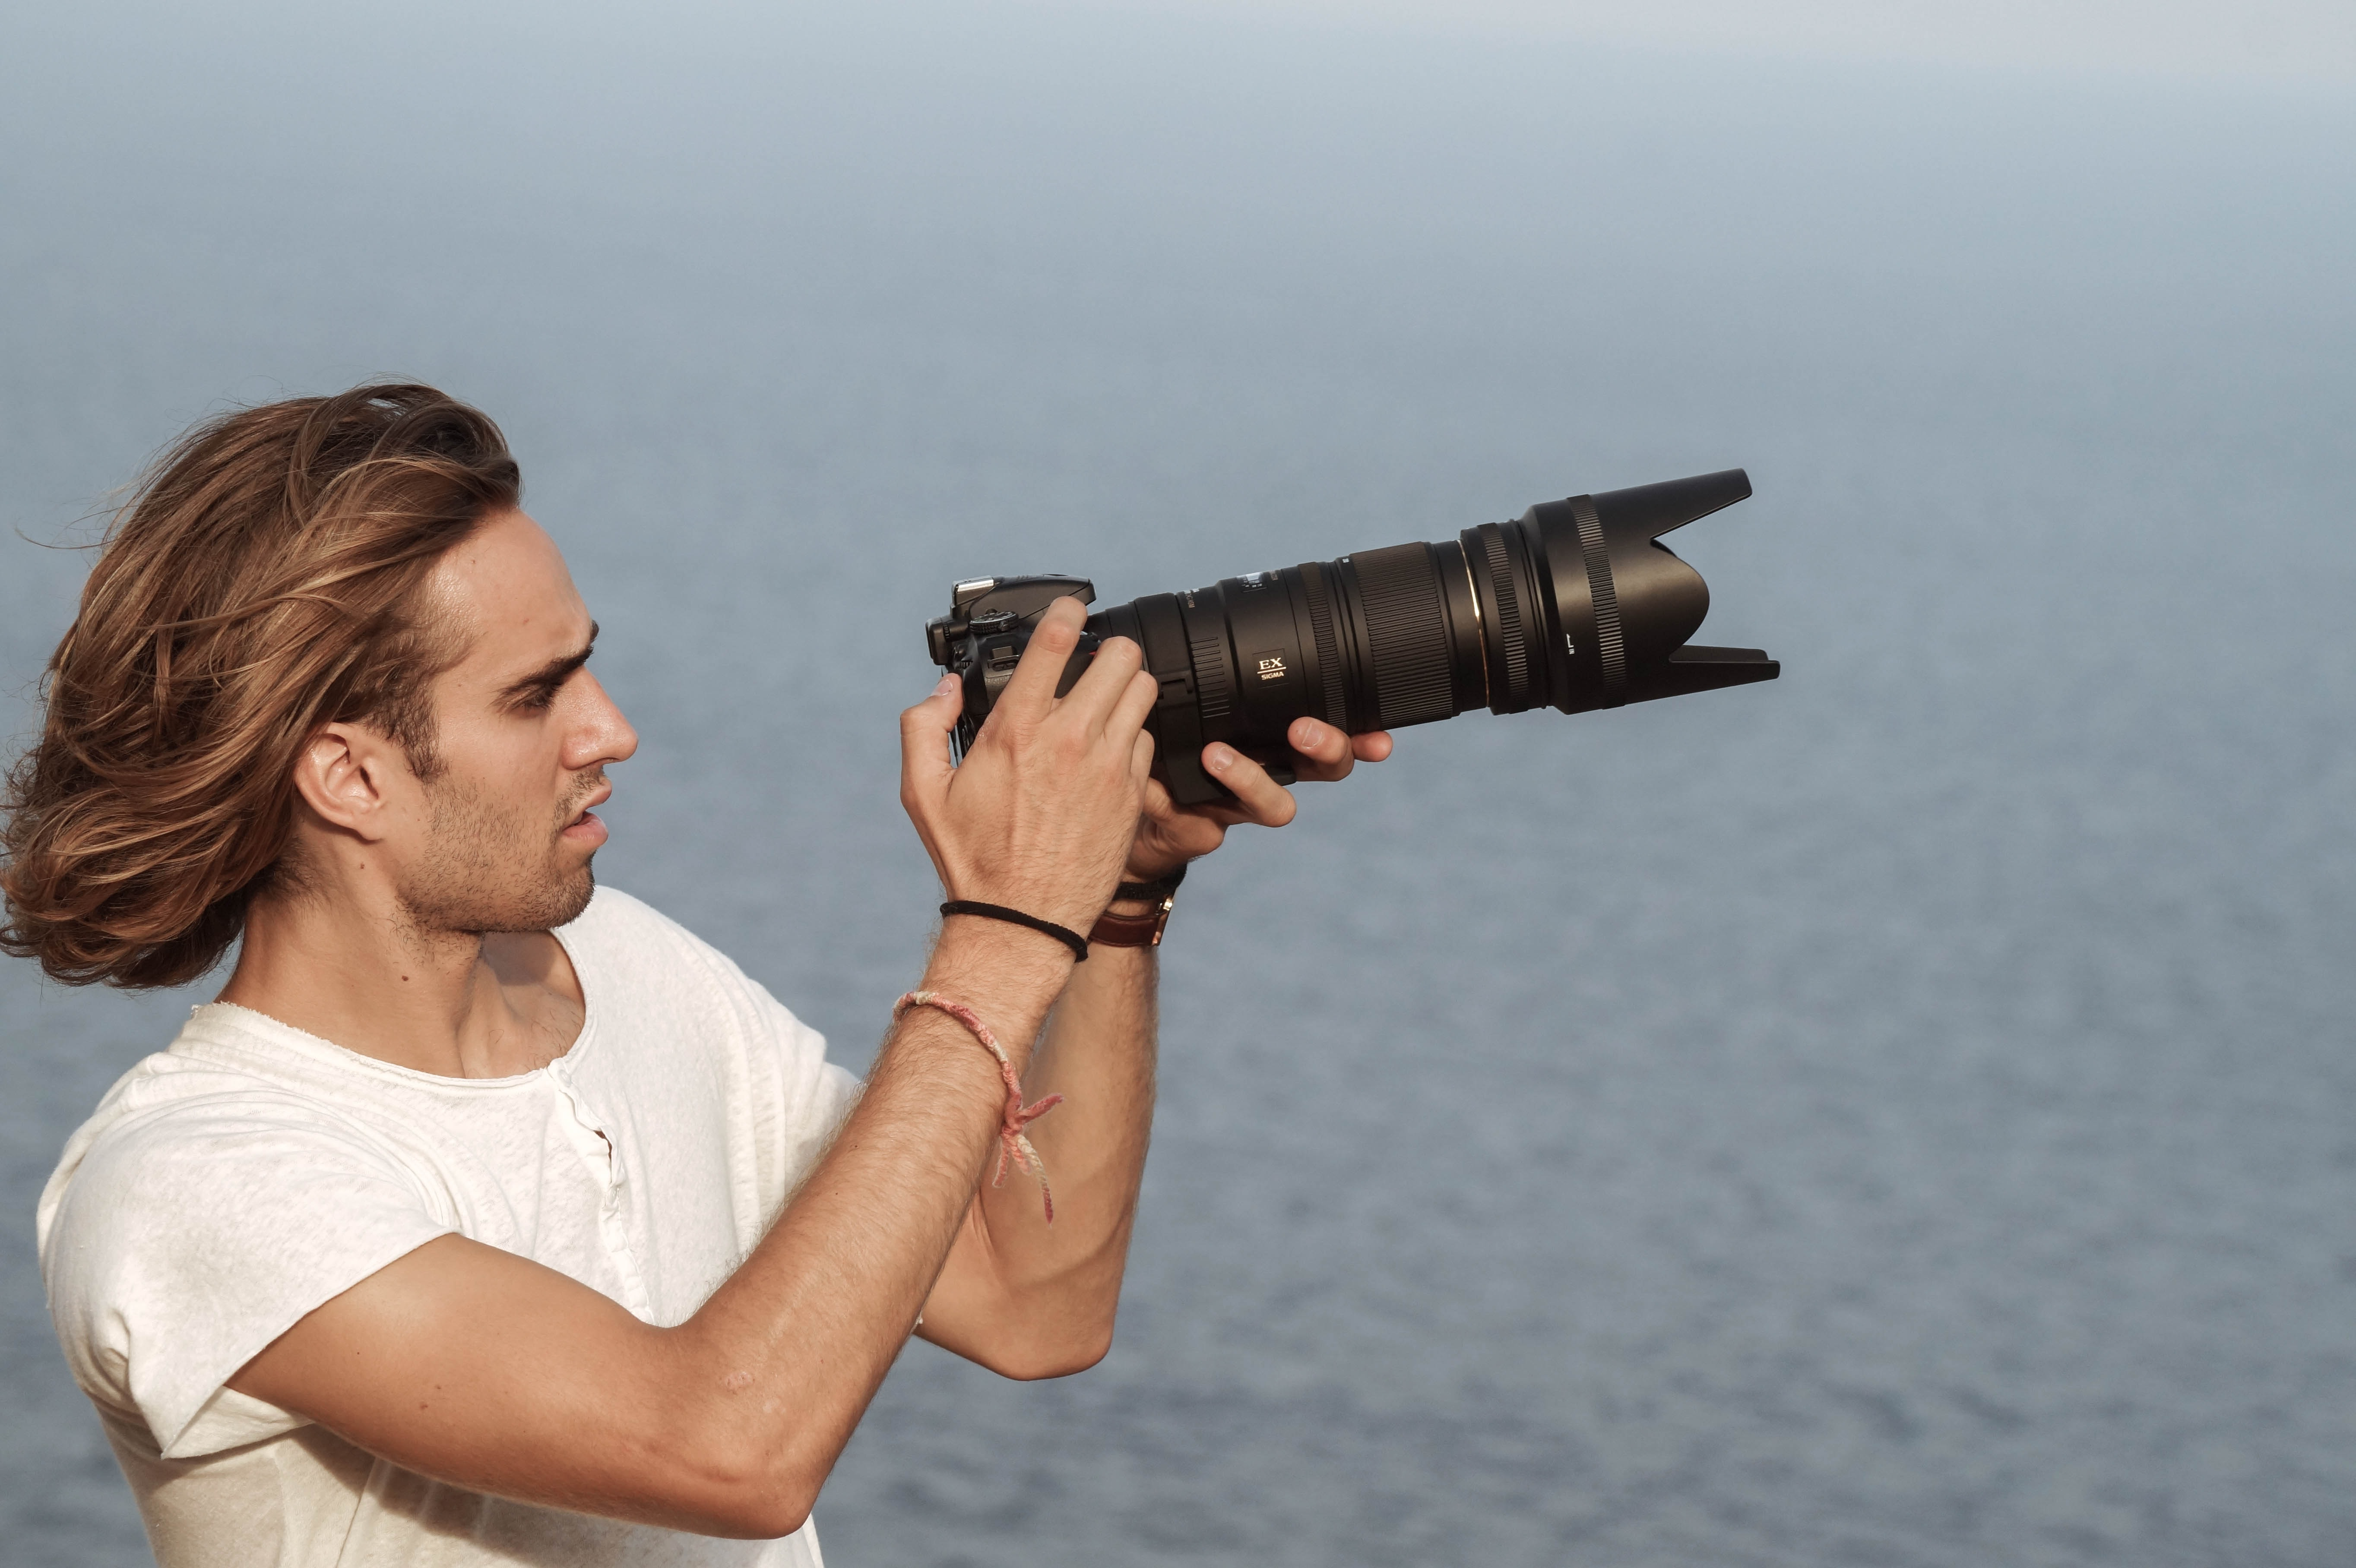 Go to Jordi Ganduxe's profile